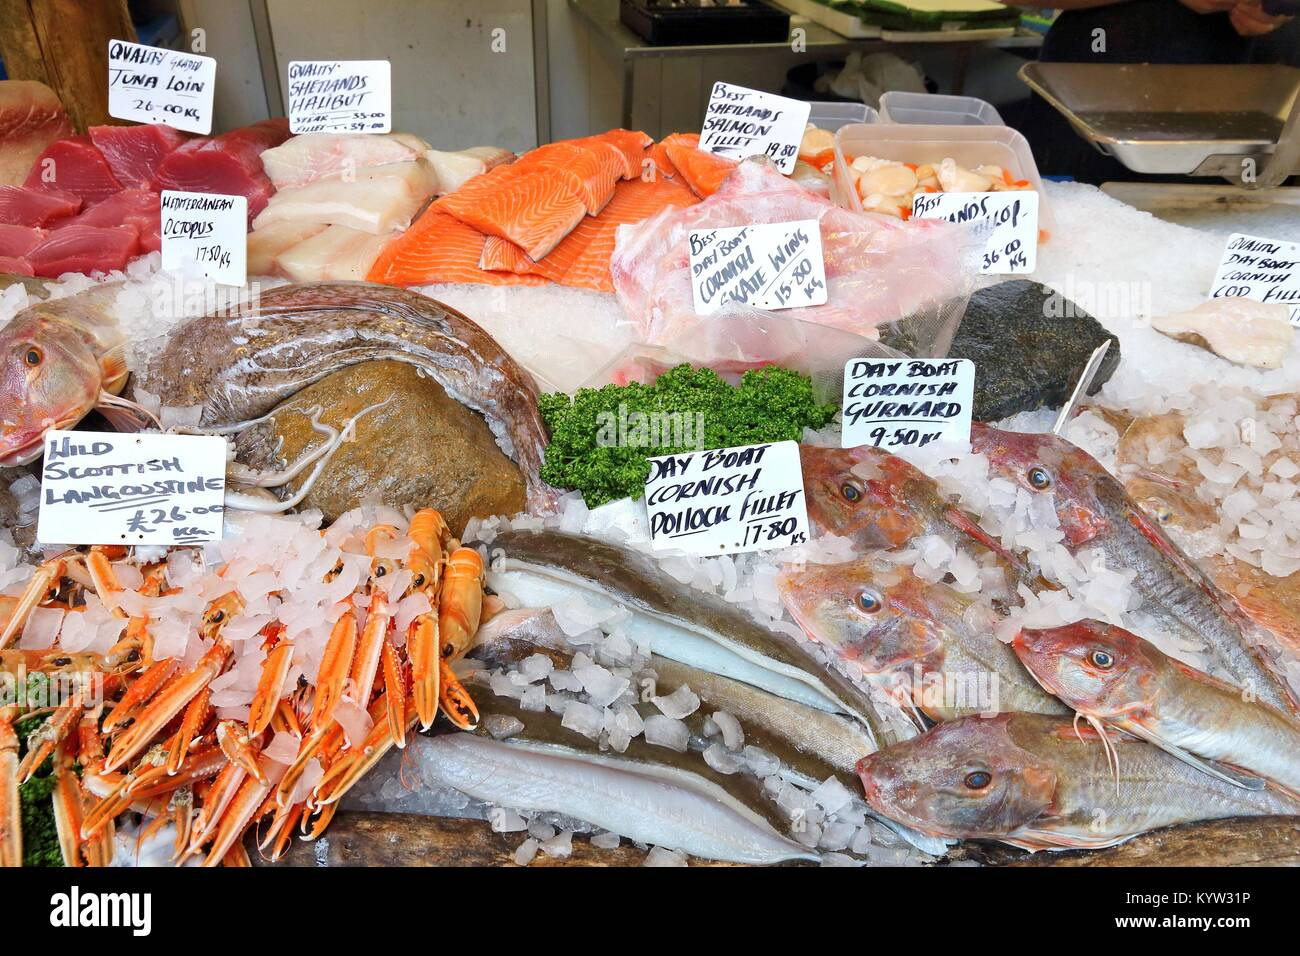 Sea food at London Borough Market, UK. - Stock Image